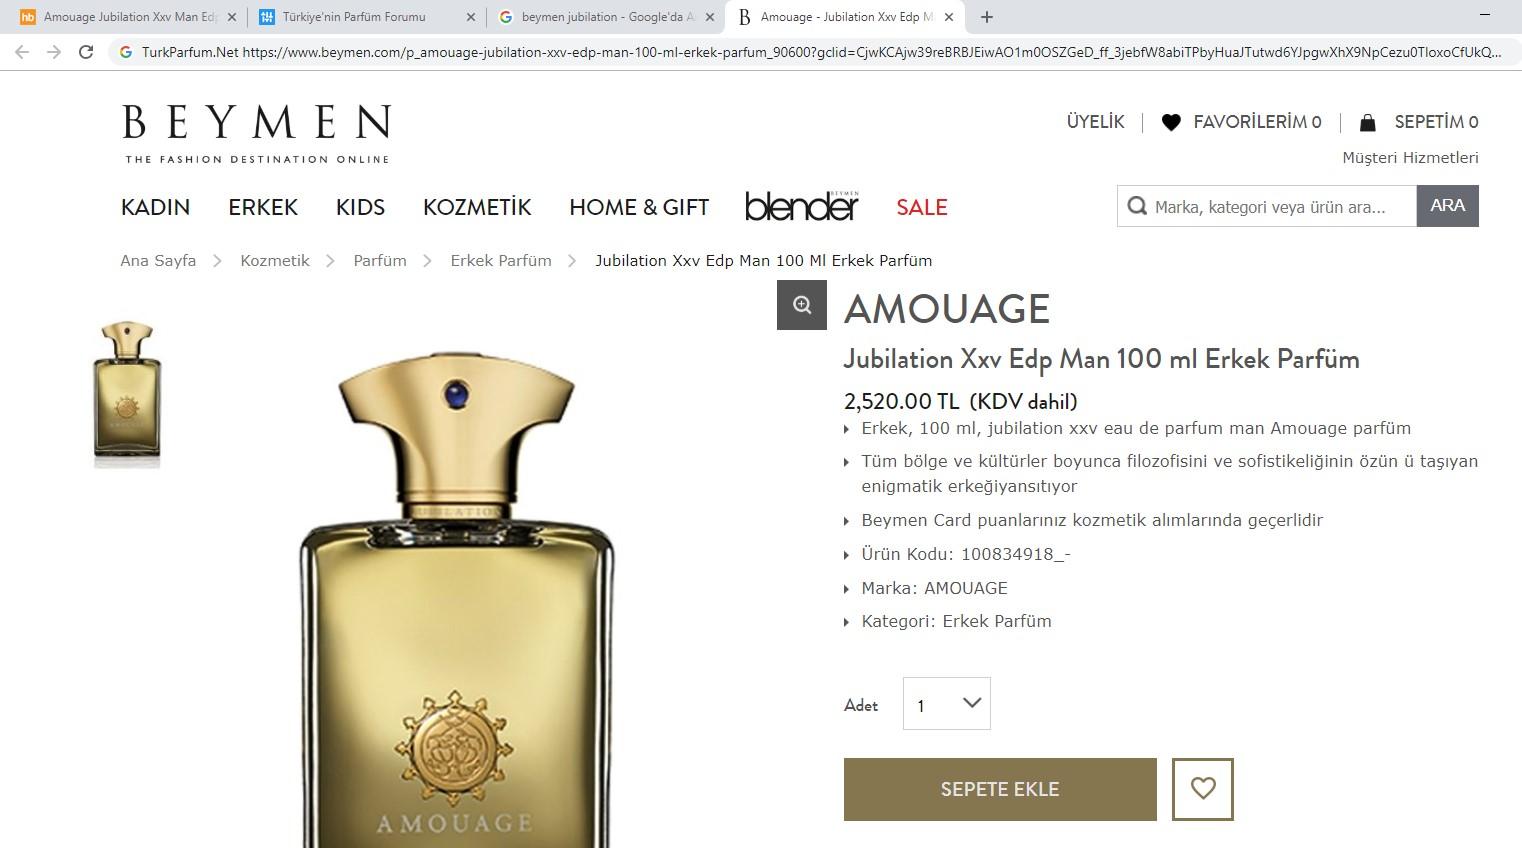 indirim amouage jubilation beymen com turkparfum net Screenshot_3.jpg